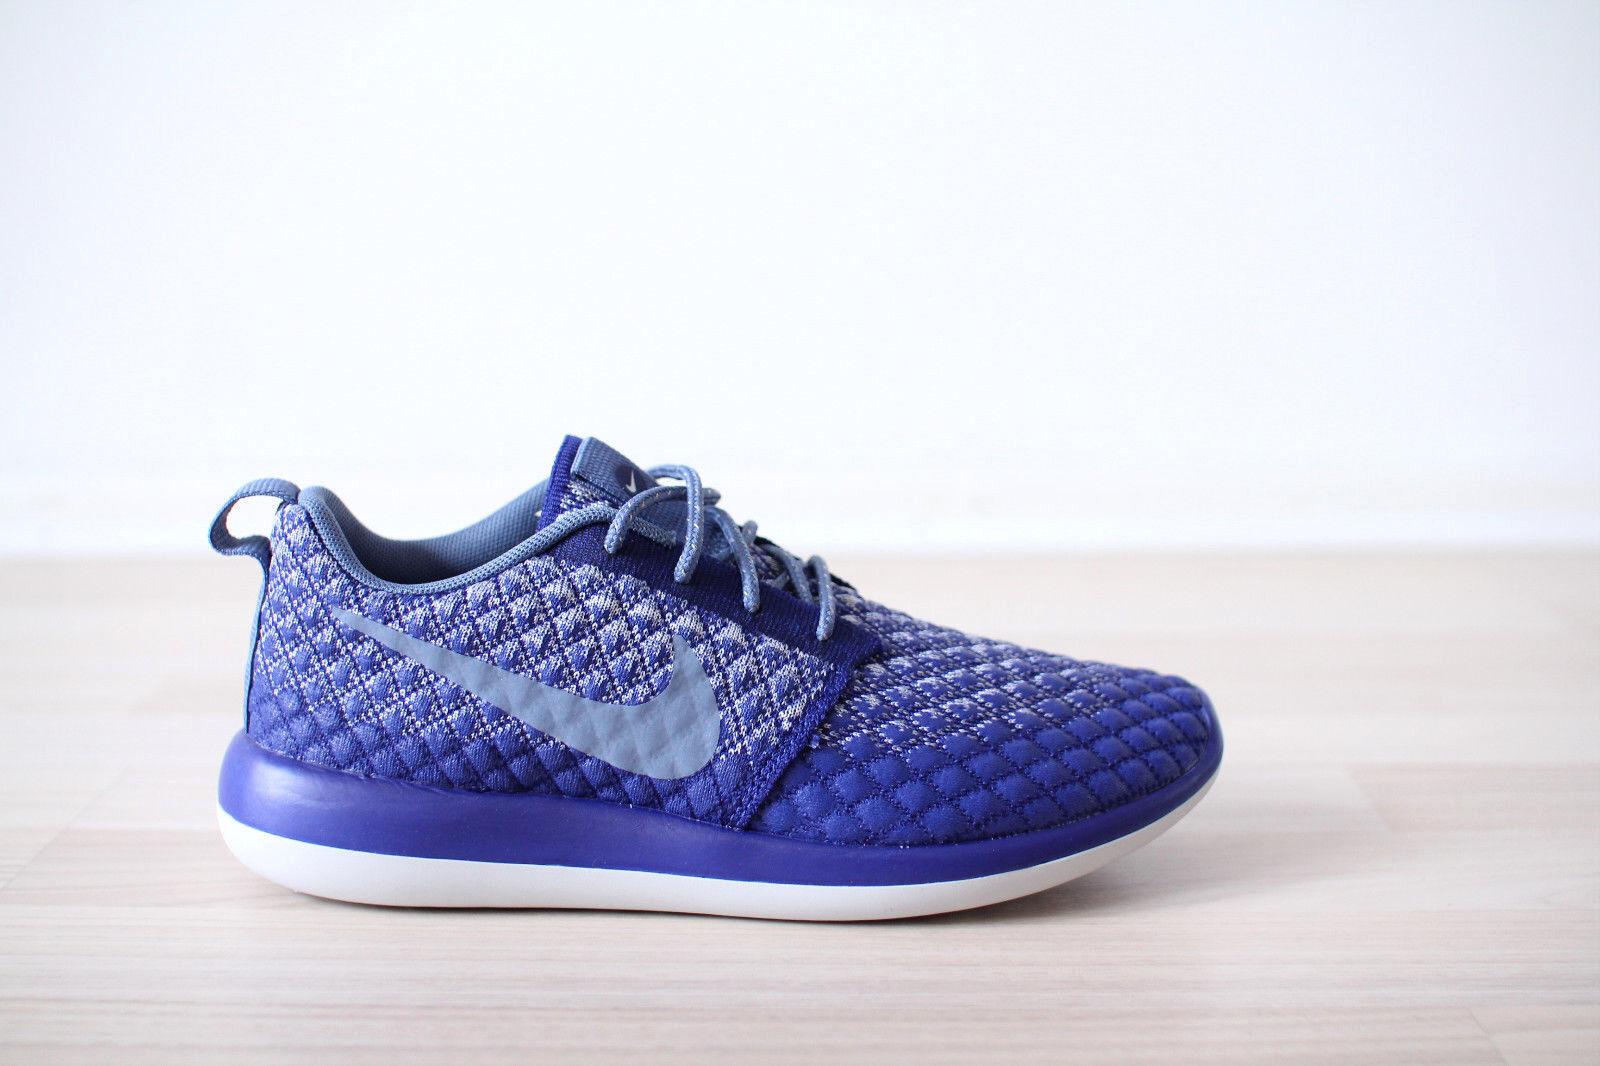 Nike Roshe Two Flyknit 365 WMNS Blau Weiß Gr. 37,38,39,40,41 NEU & OVP